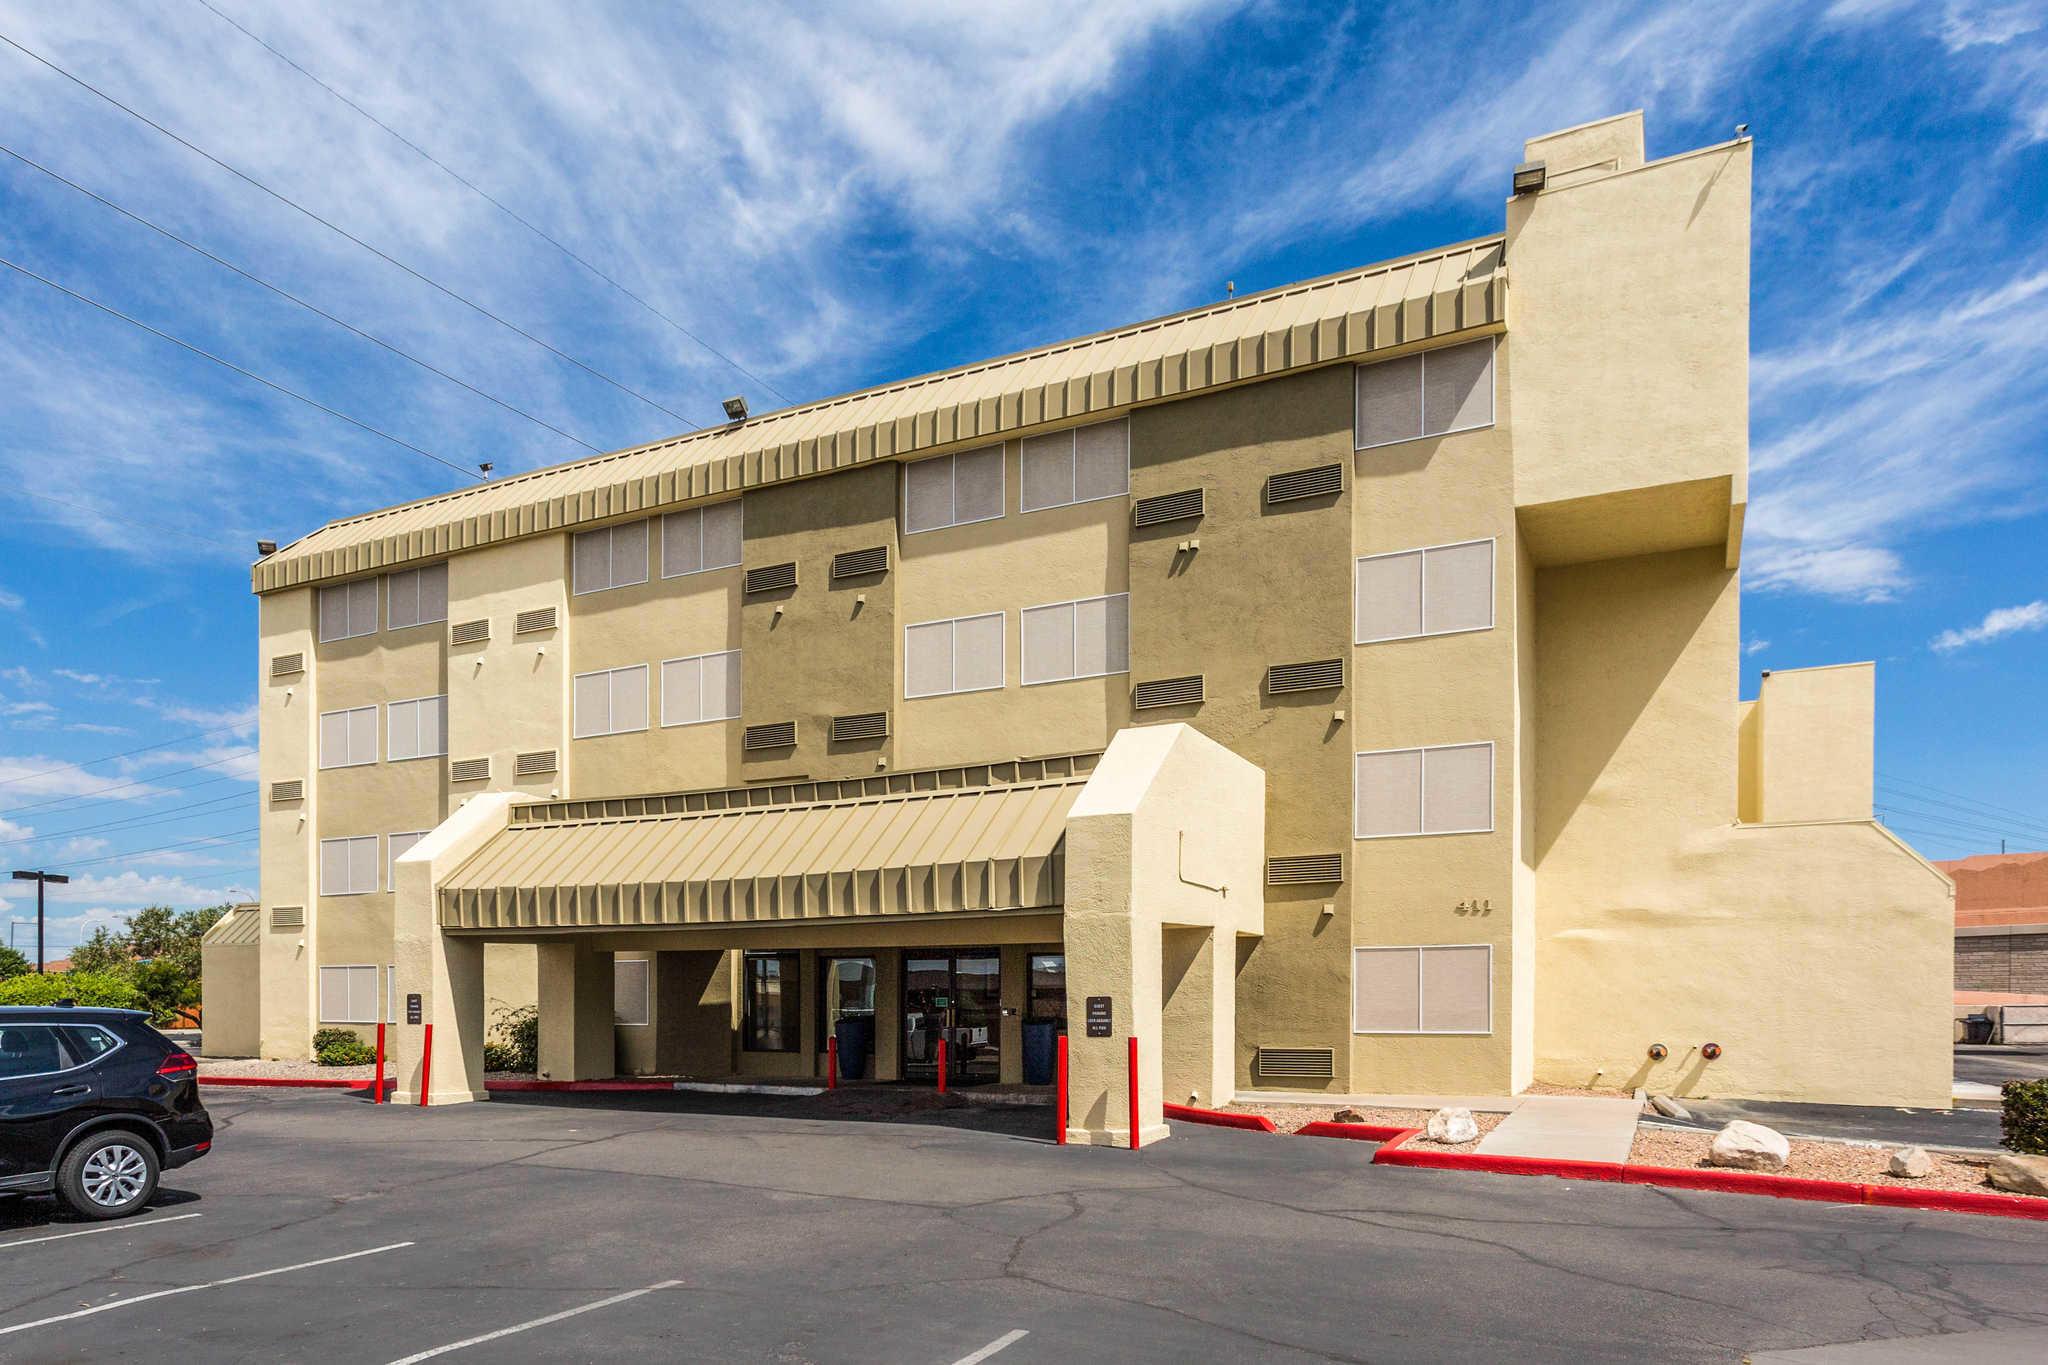 Comfort Inn & Suites Albuquerque Downtown image 3